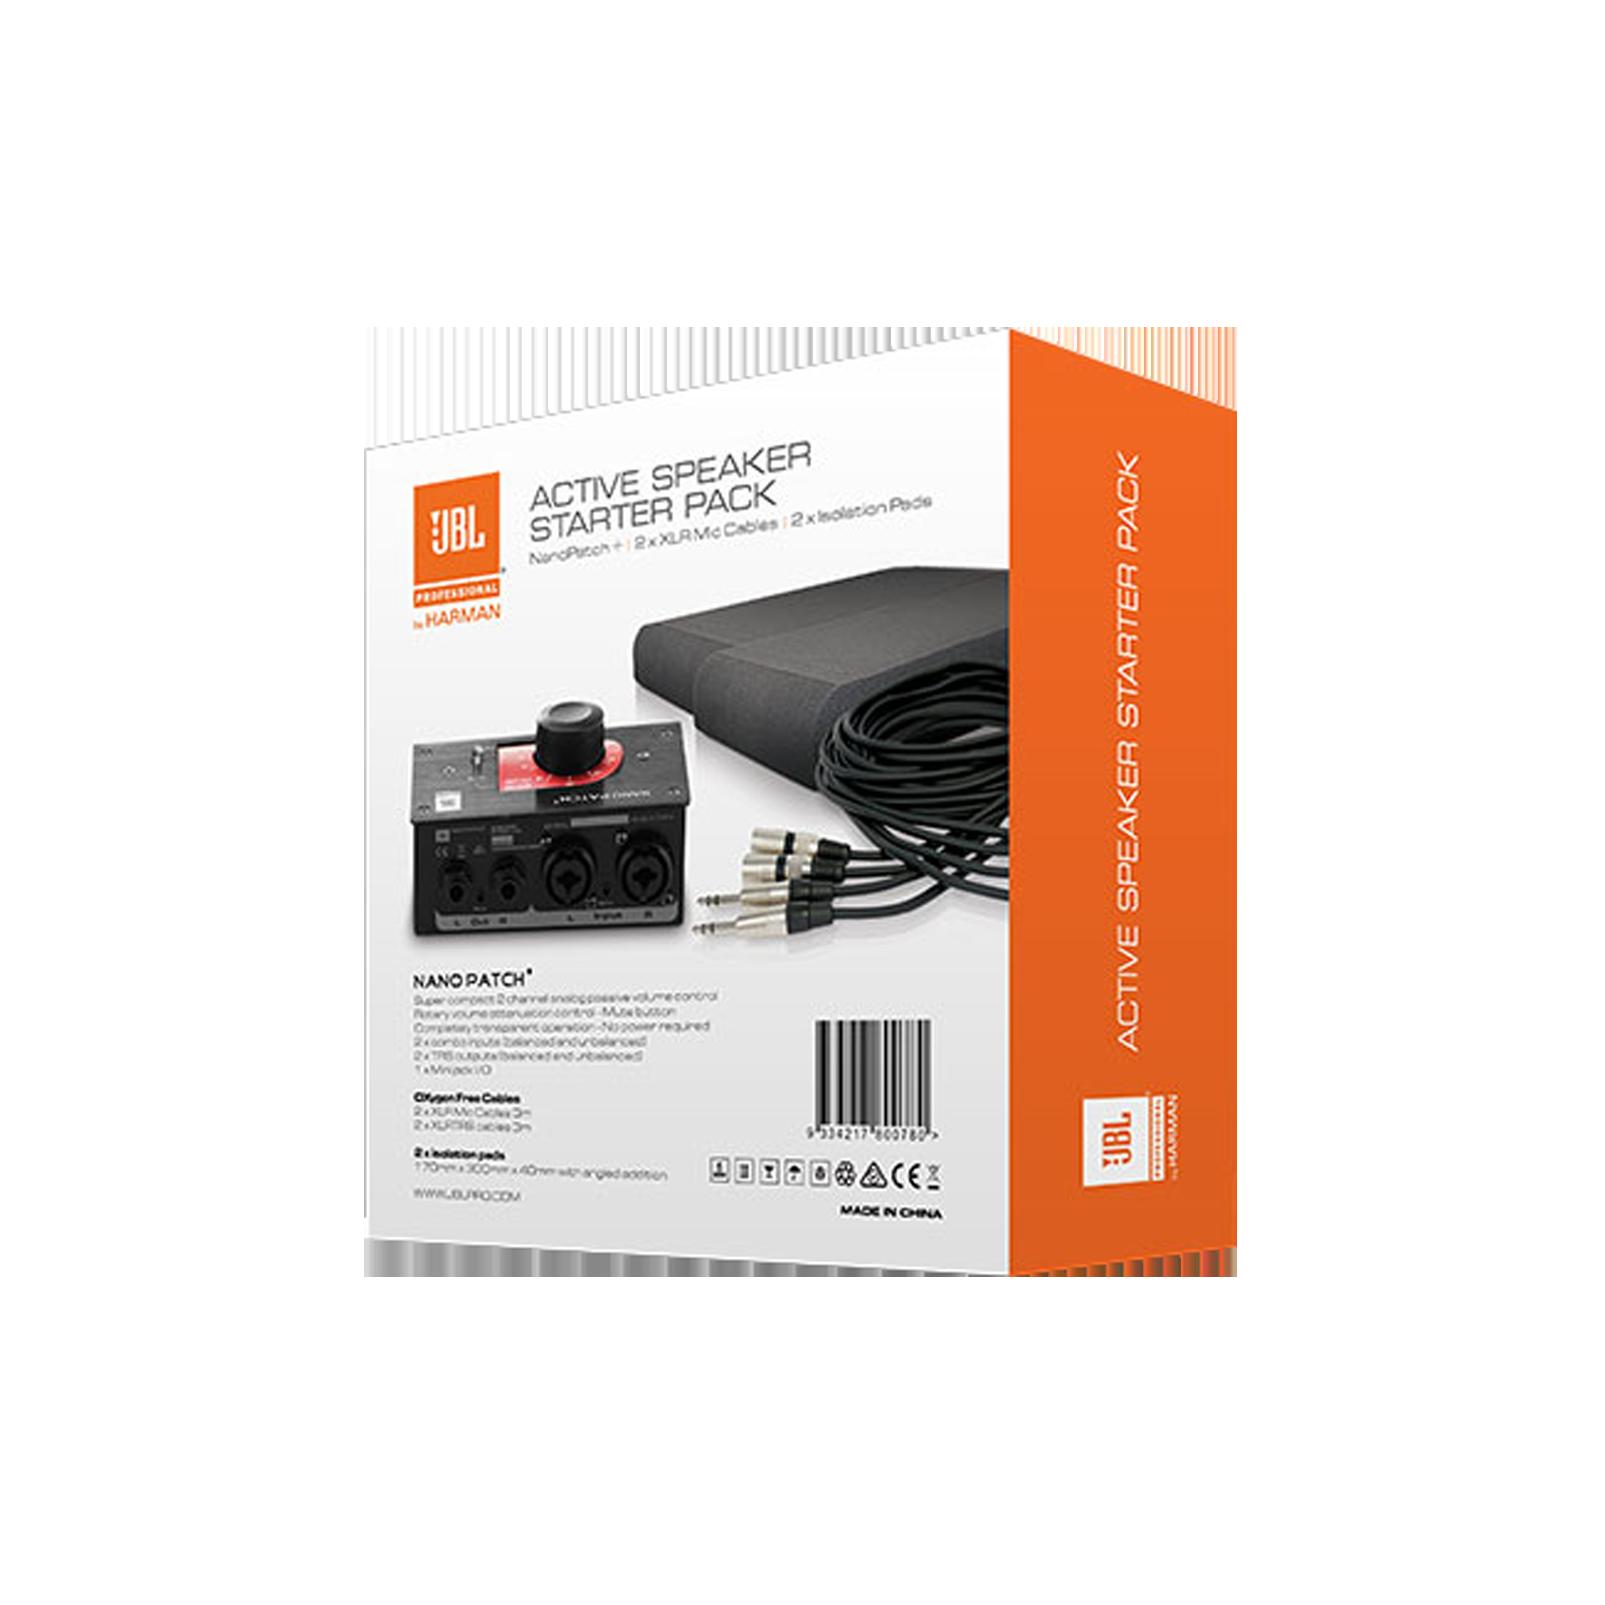 JBL Active Speaker Starter Set